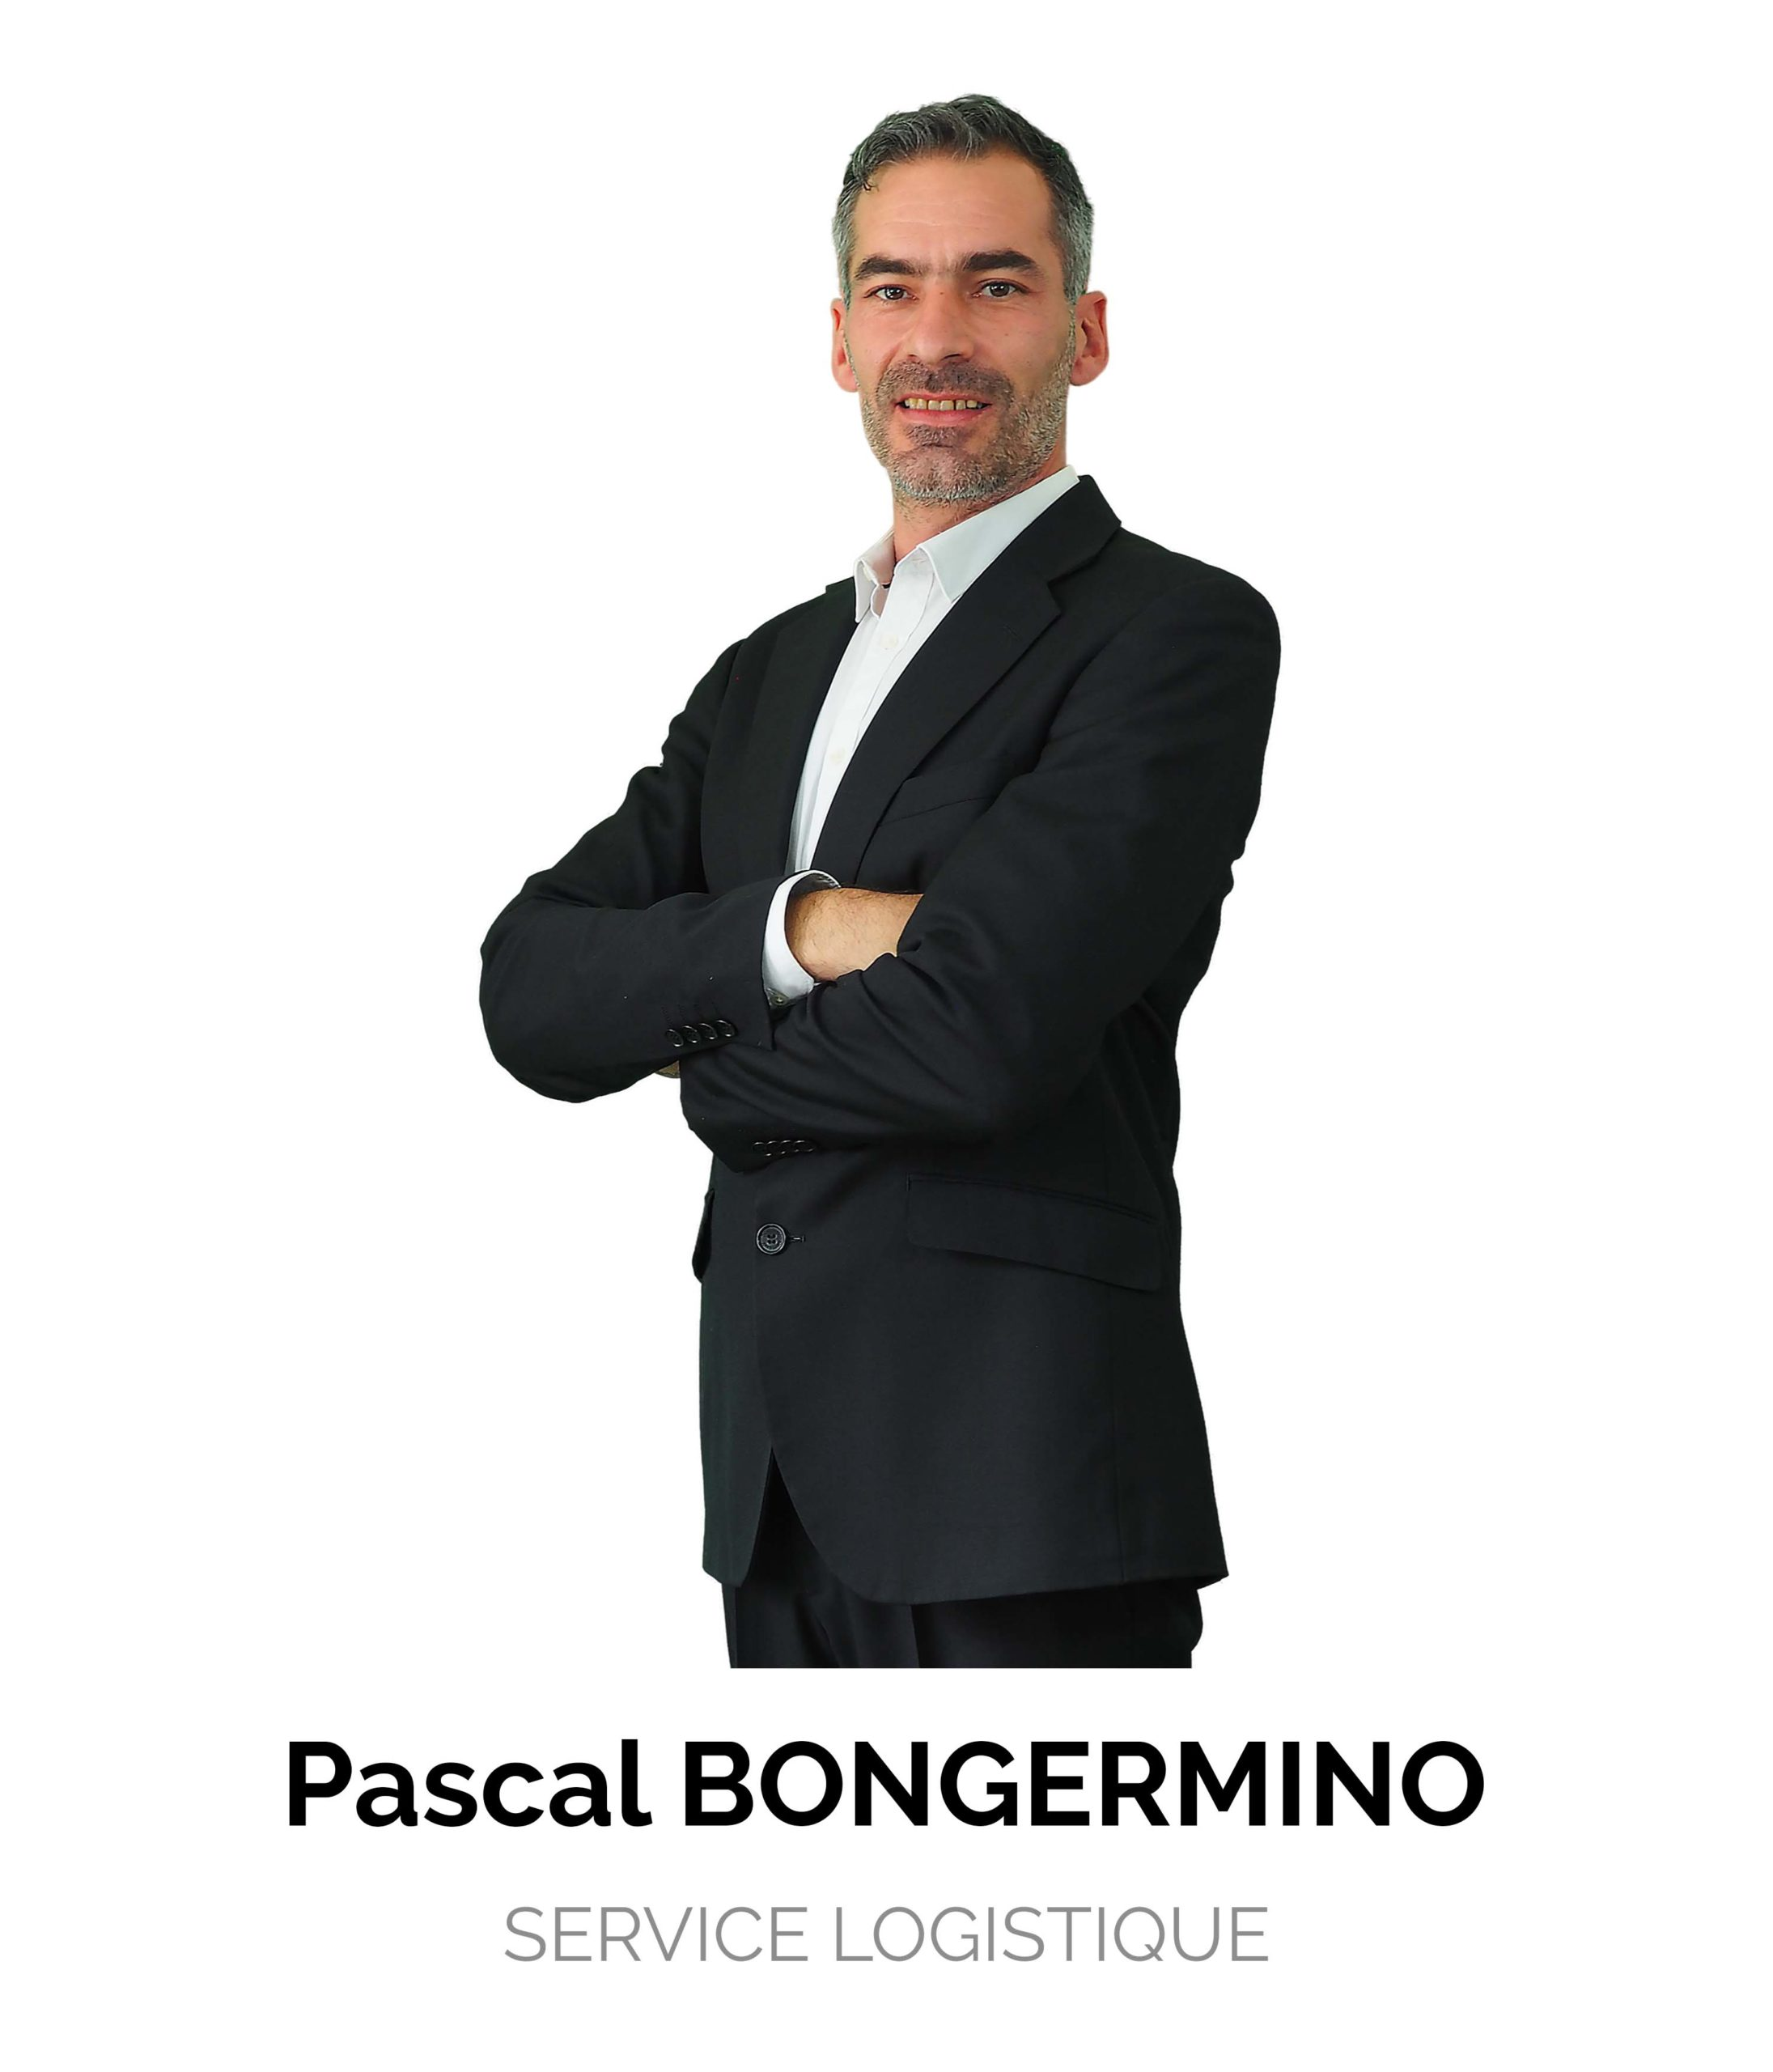 Pascal Bongermino Service Logistique